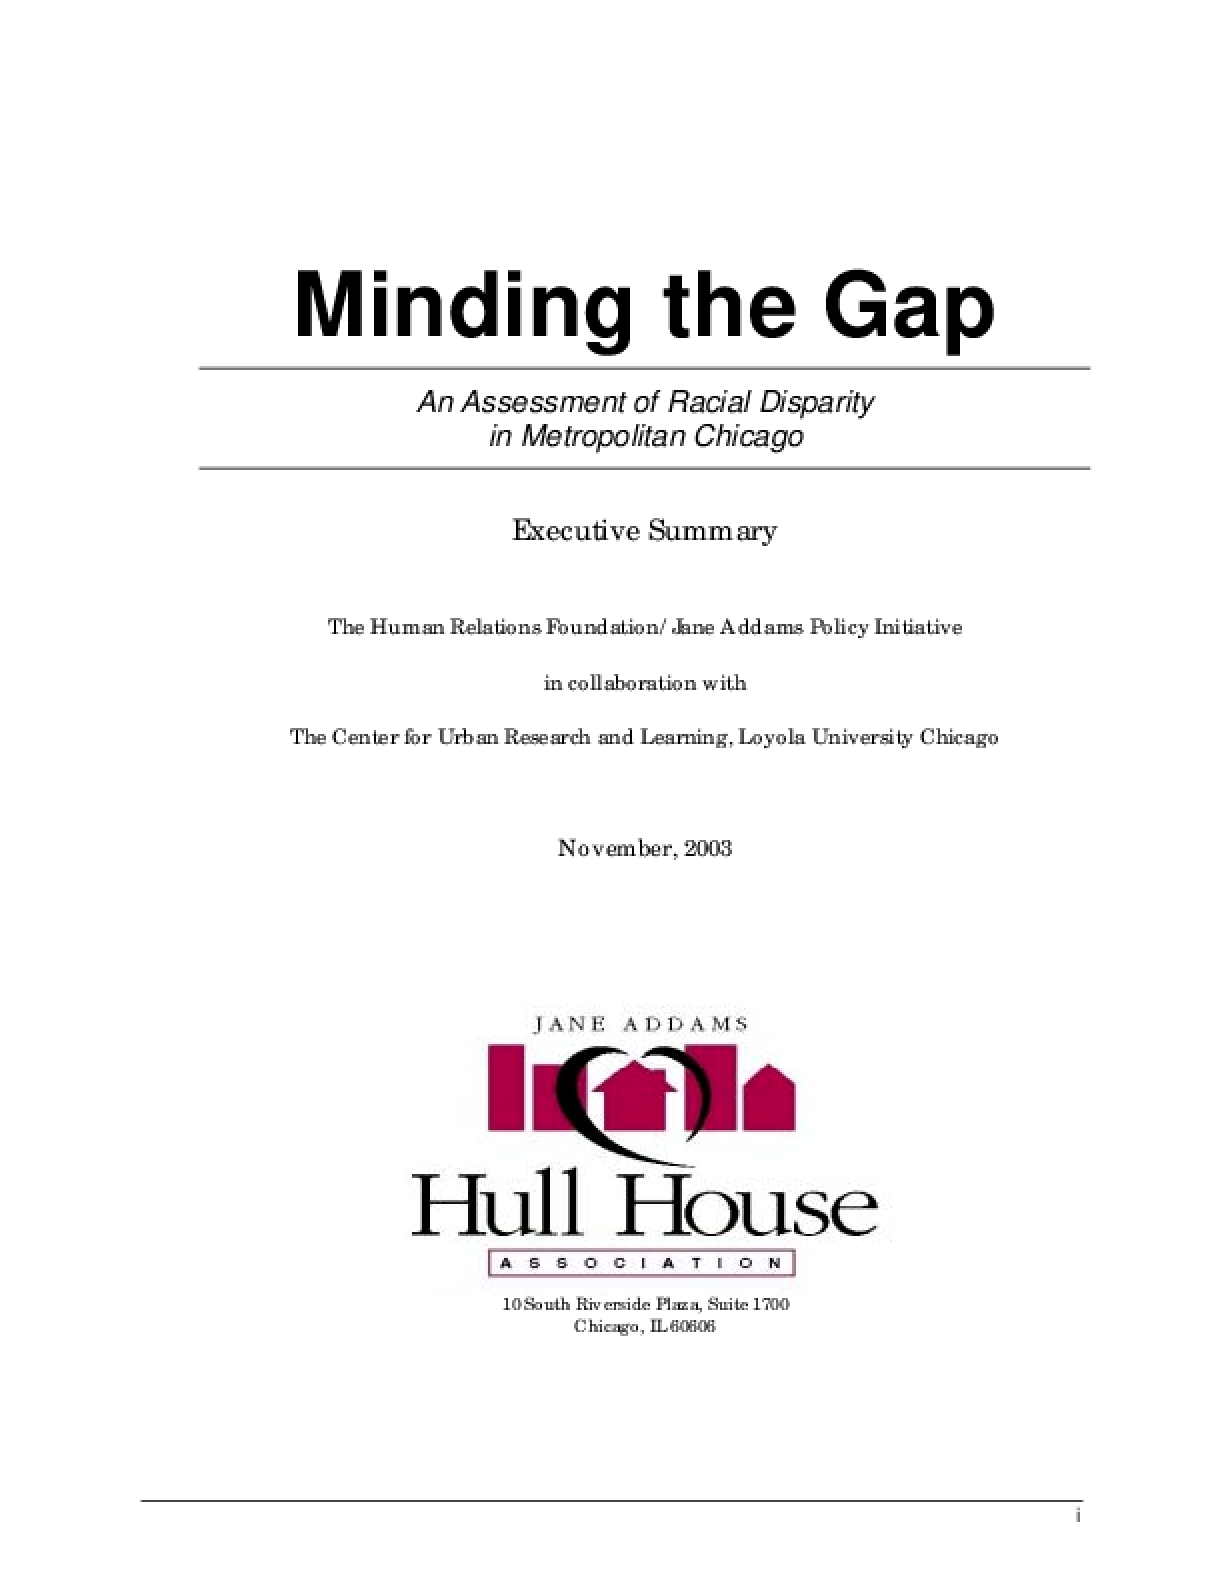 Minding the Gap: An Assessment of Racial Disparity in Metropolitan Chicago - Executive Summary